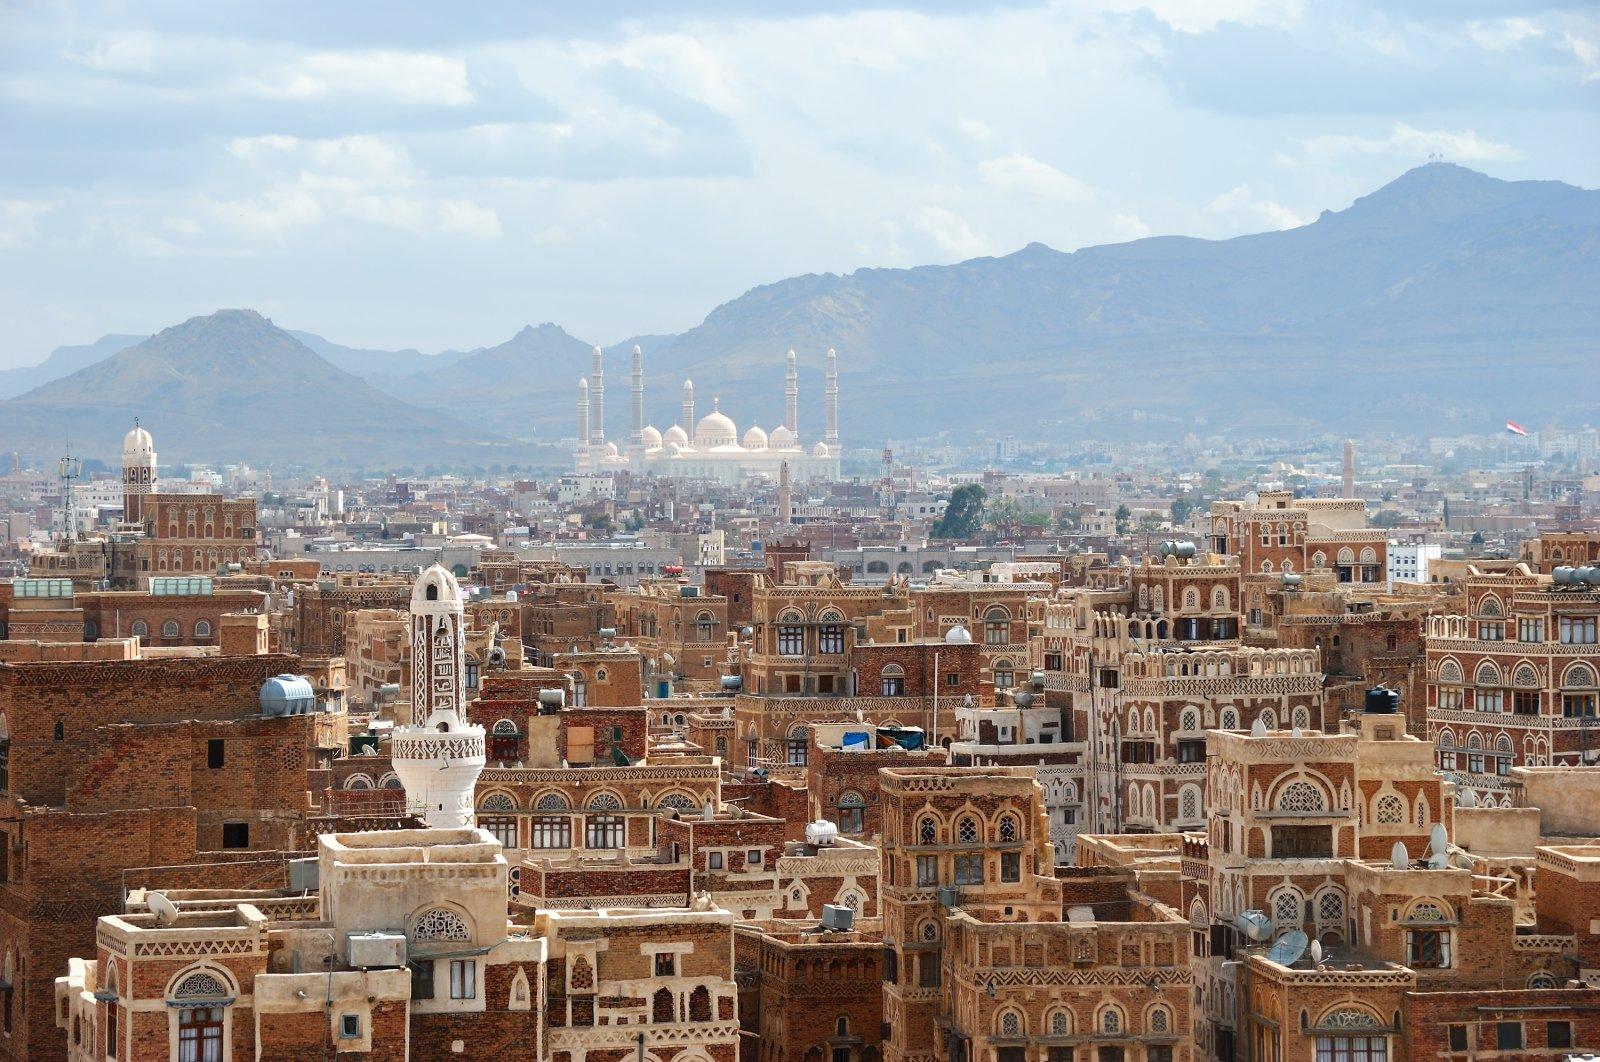 The Old City of Sanaa, Yemen, seen in an undated photo. (Shutterstock Photo)